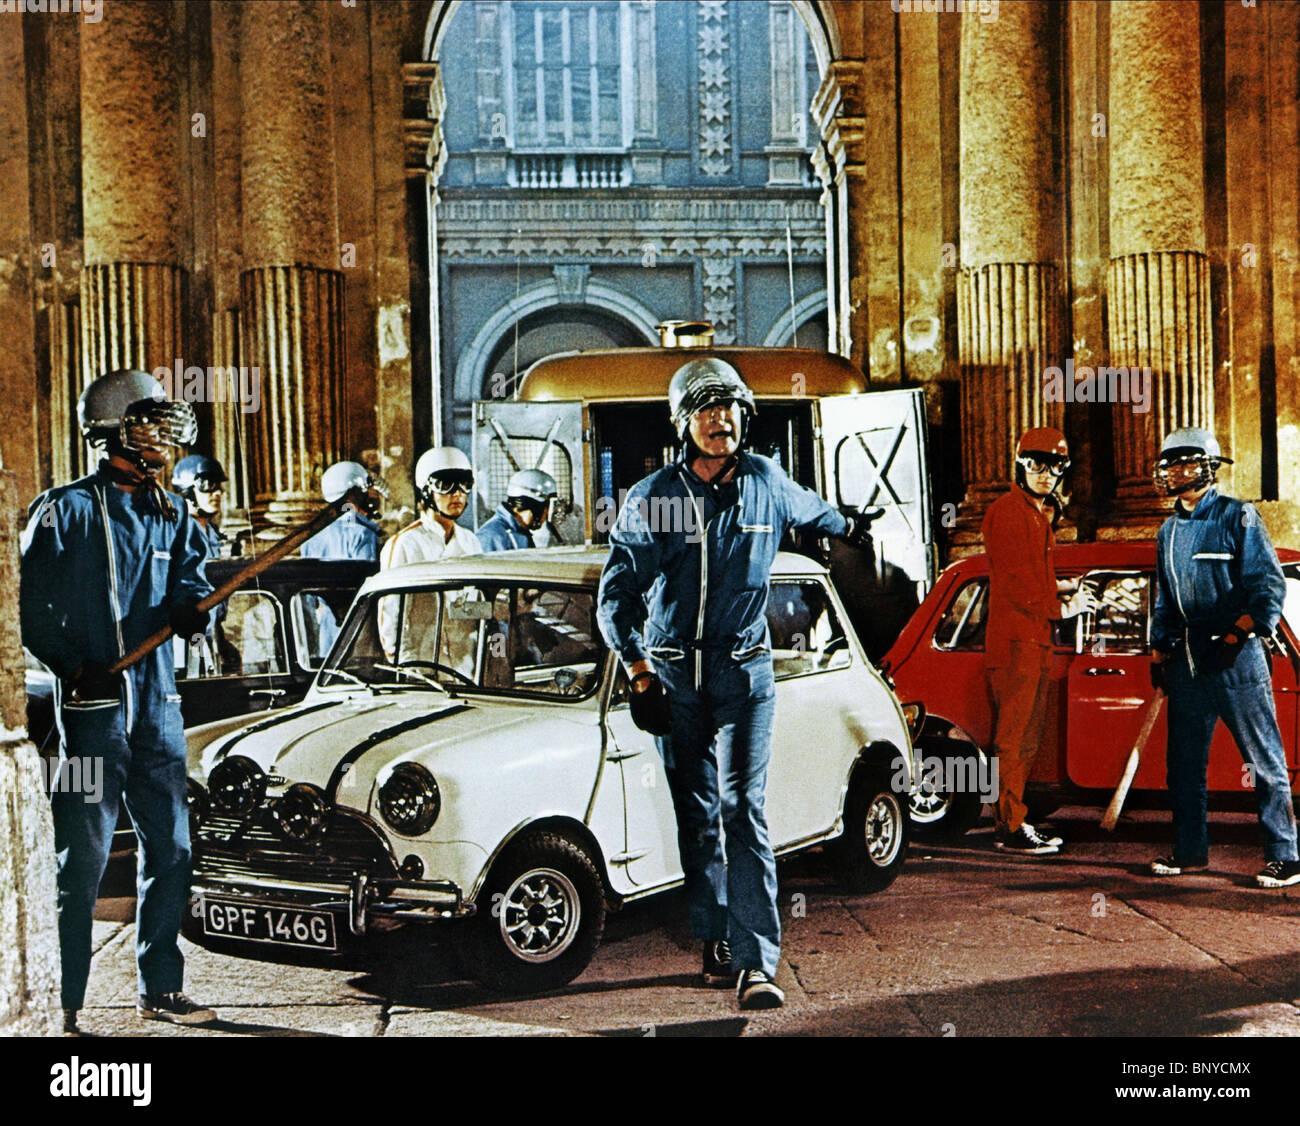 Michael caine the italian job (1969 stock photo: 30720842 alamy.